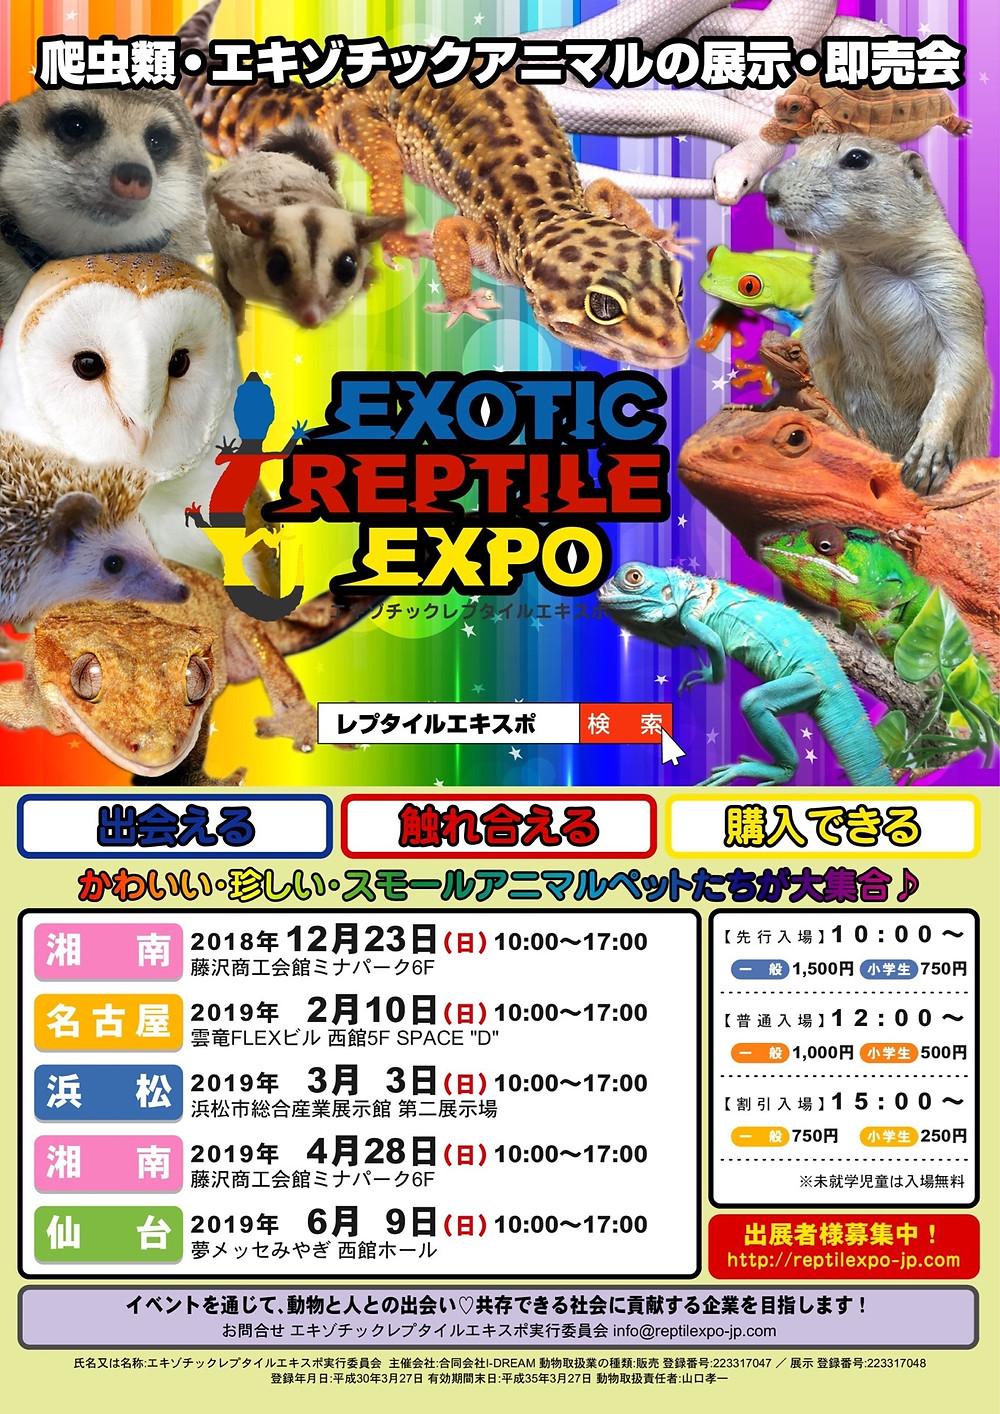 EXOTIC REPTILE EXPO